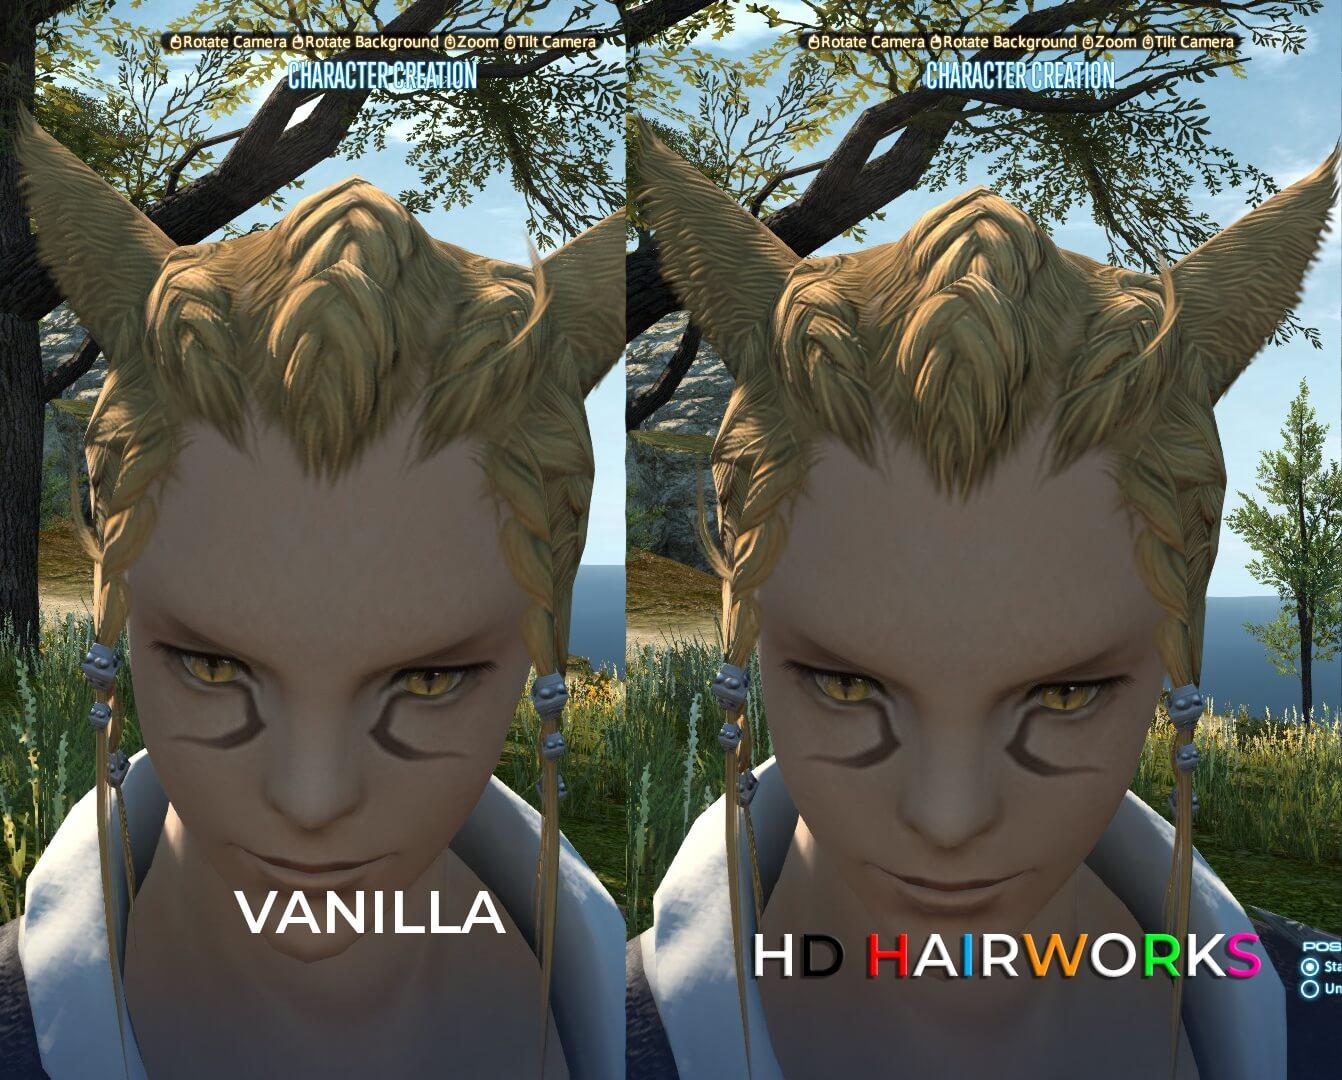 Мод HD Hairworks 2 для Final Fantasy XIV, содержащий более 700